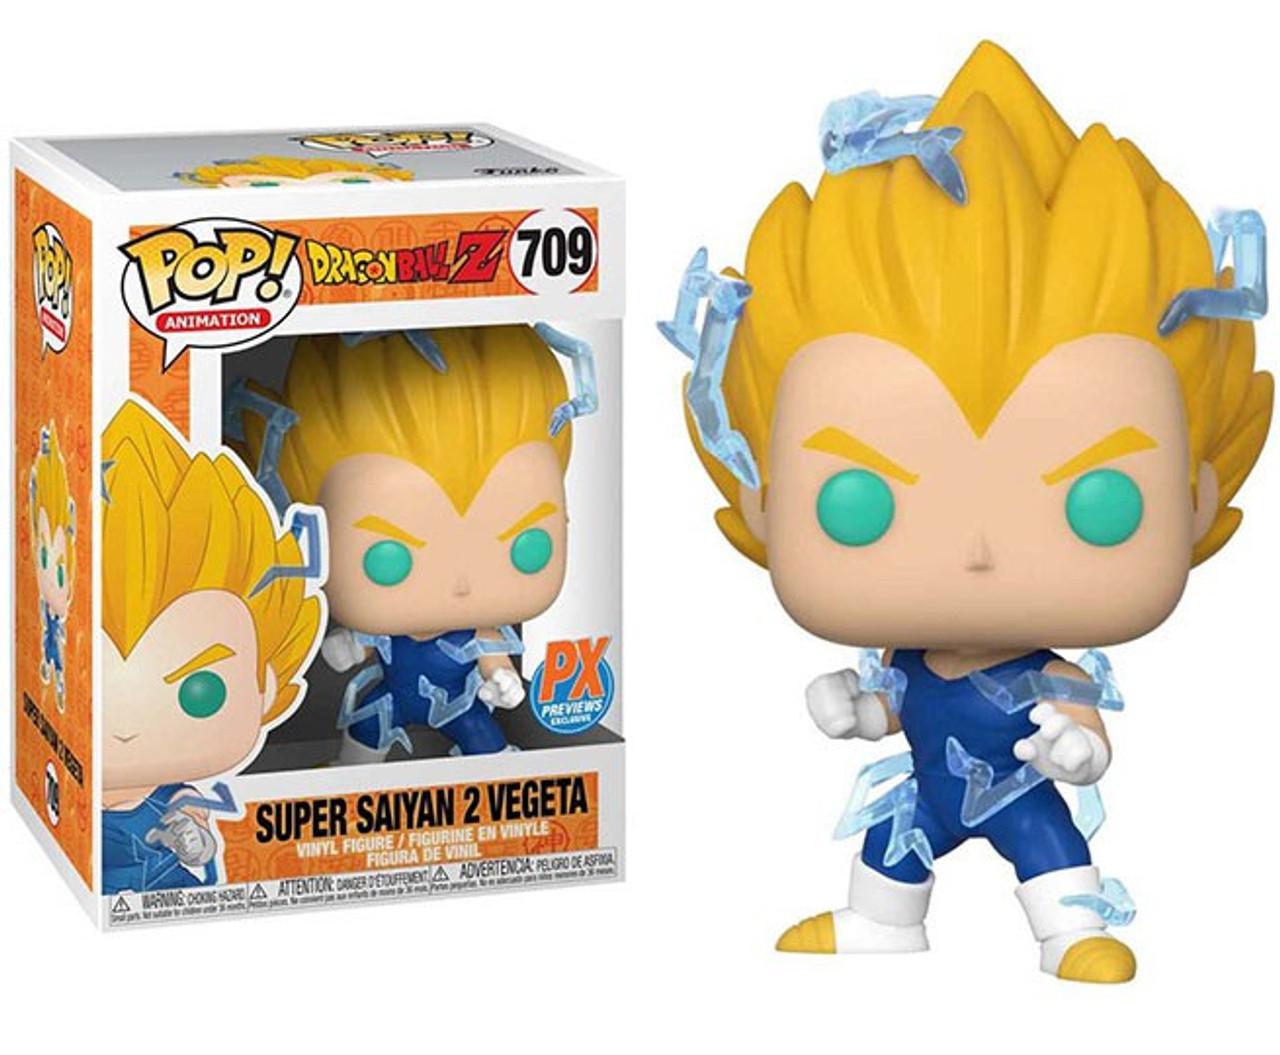 Funko POP Dragon Ball Z Majin Vegeta Super Saiyan Vegeta Vinyl Figure In Box US